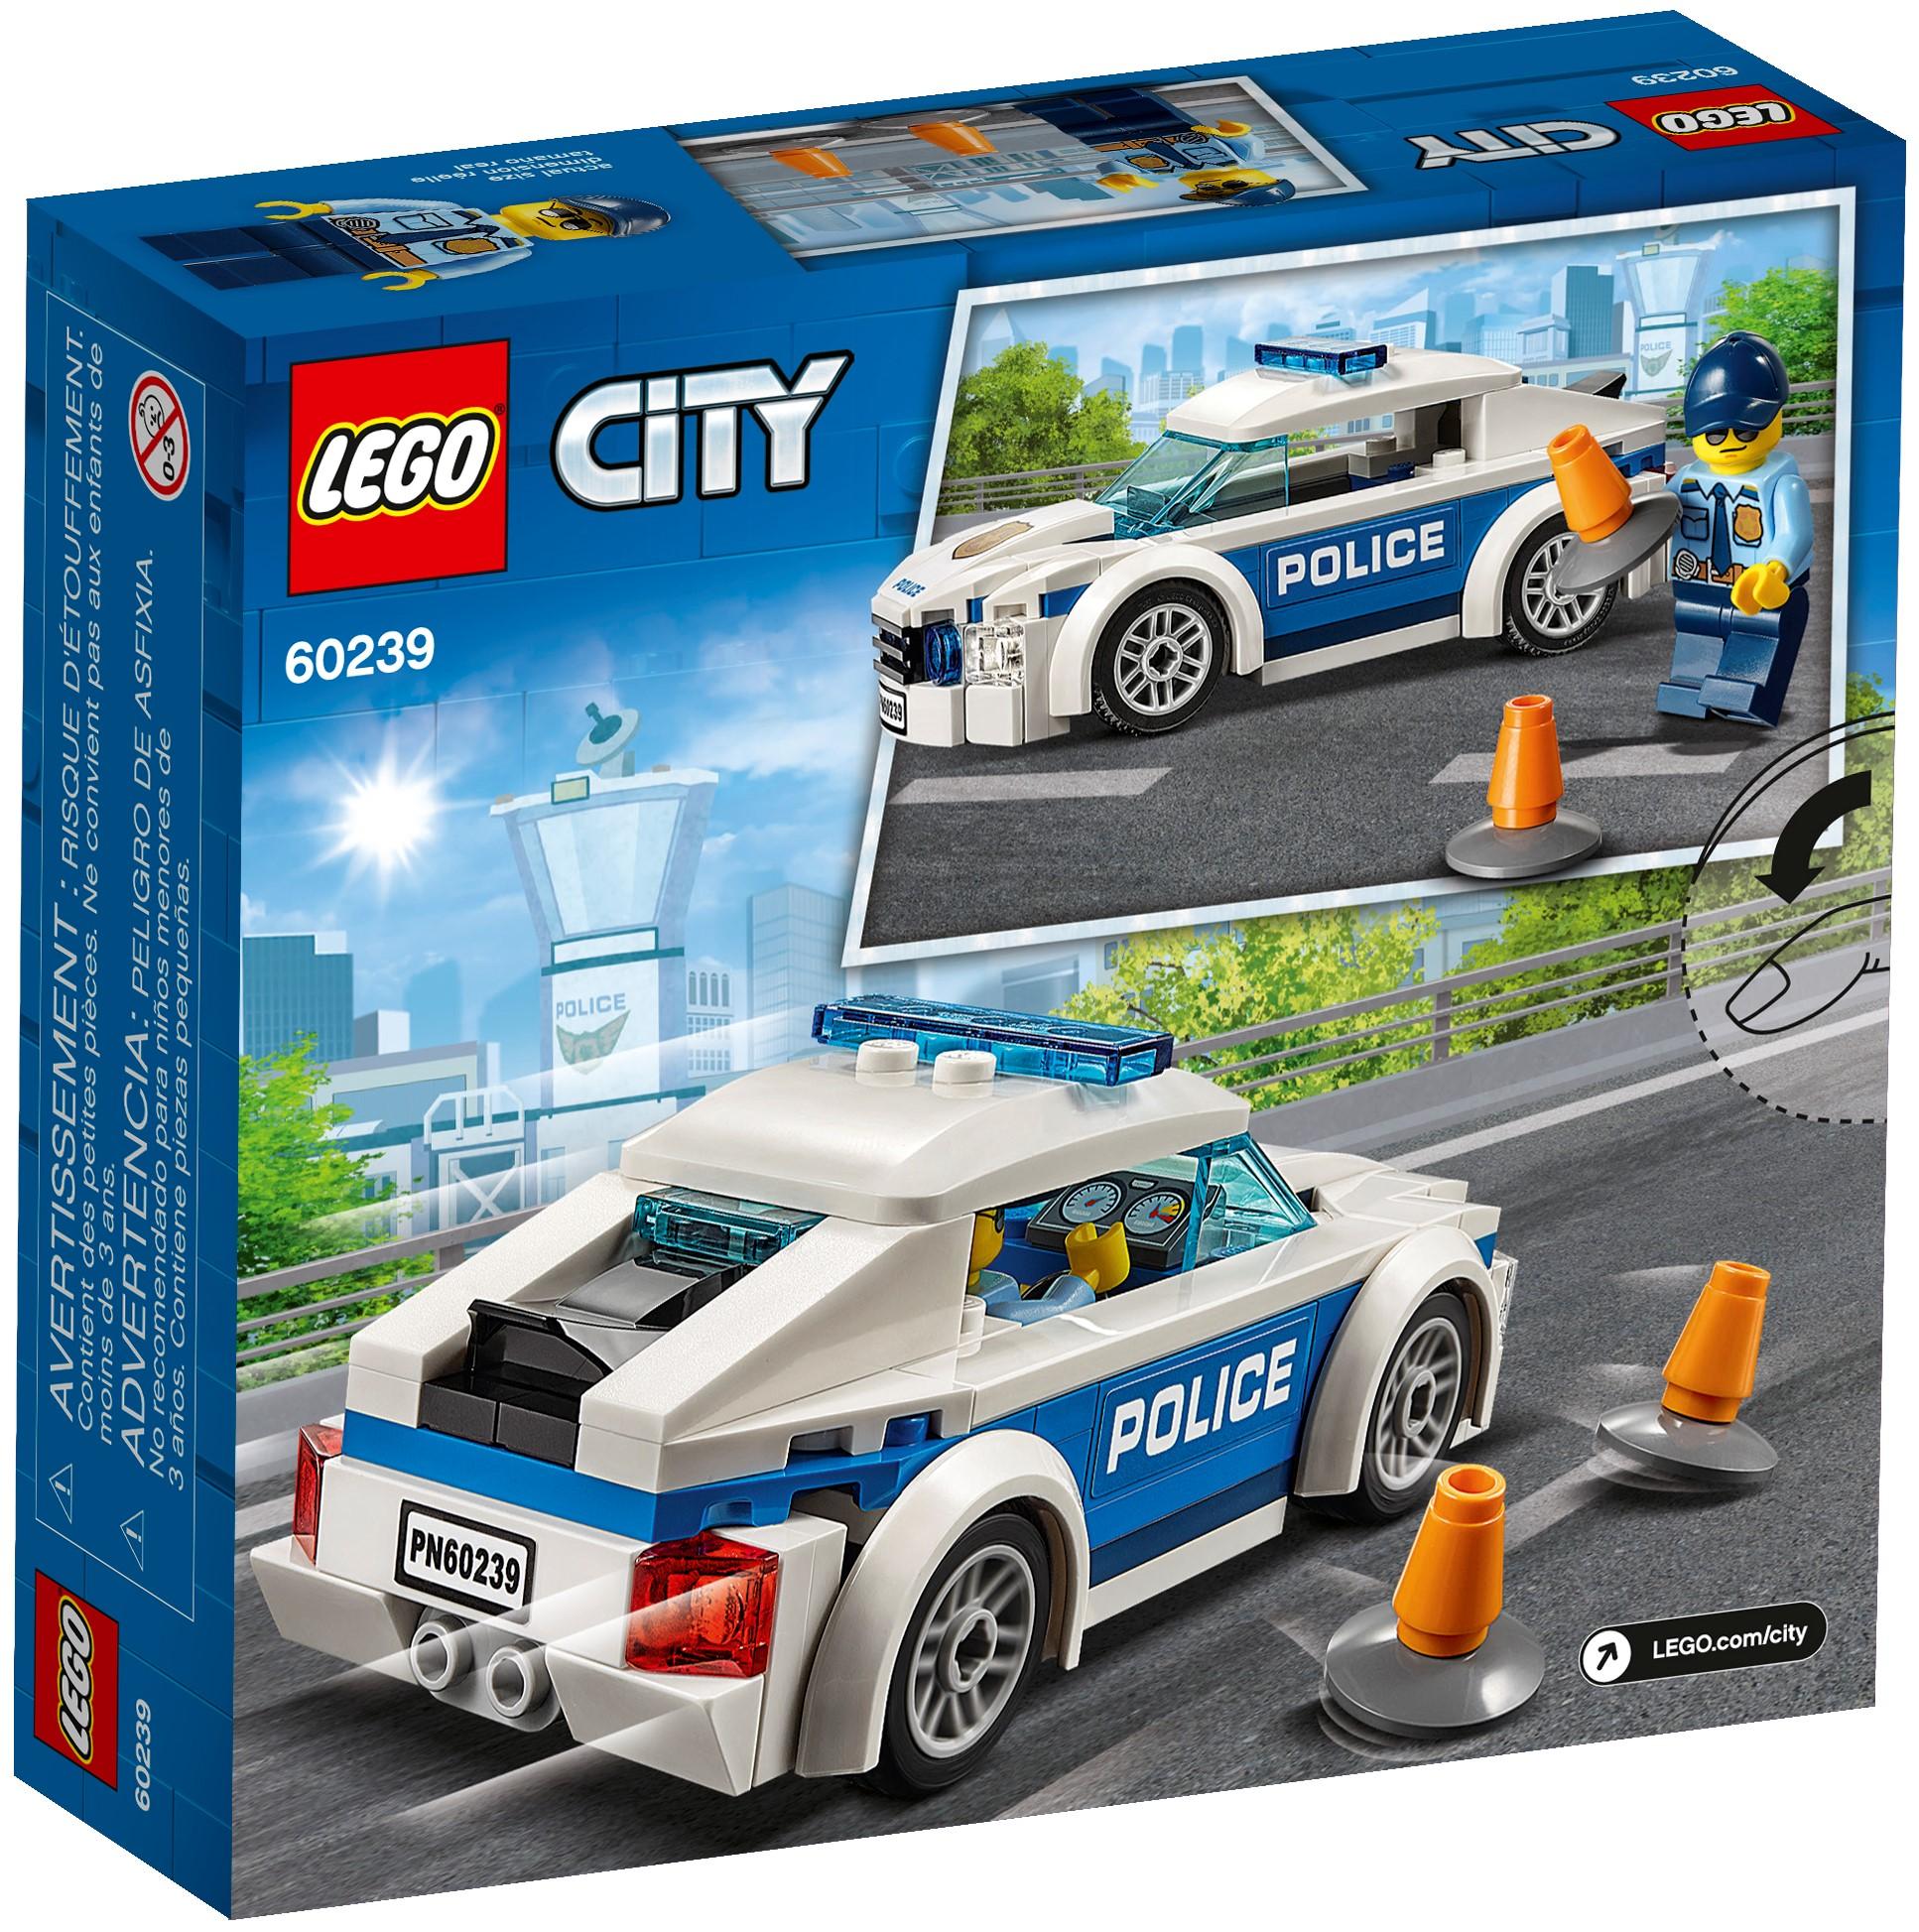 LEGO City 60239 Polispatrullbil